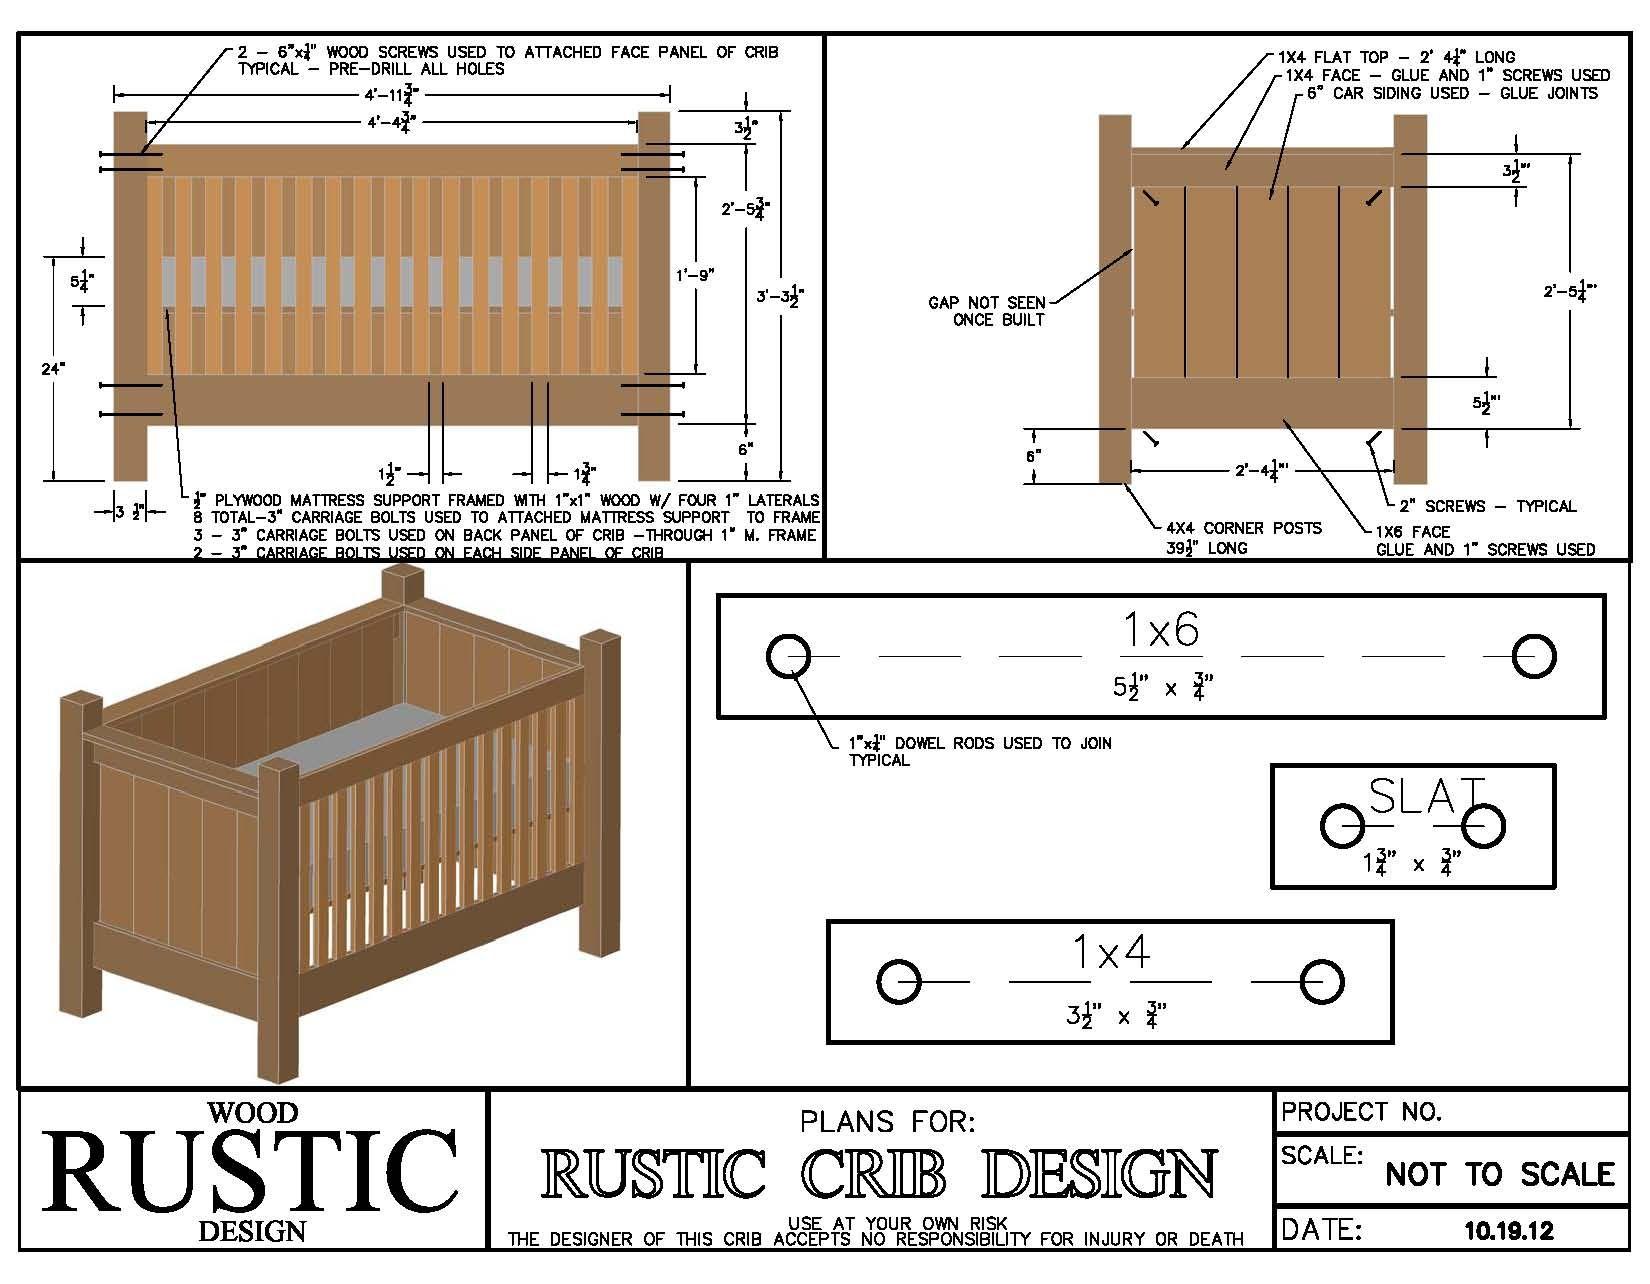 Rustic Baby Crib Plans   www.imgkid.com - The Image Kid ...